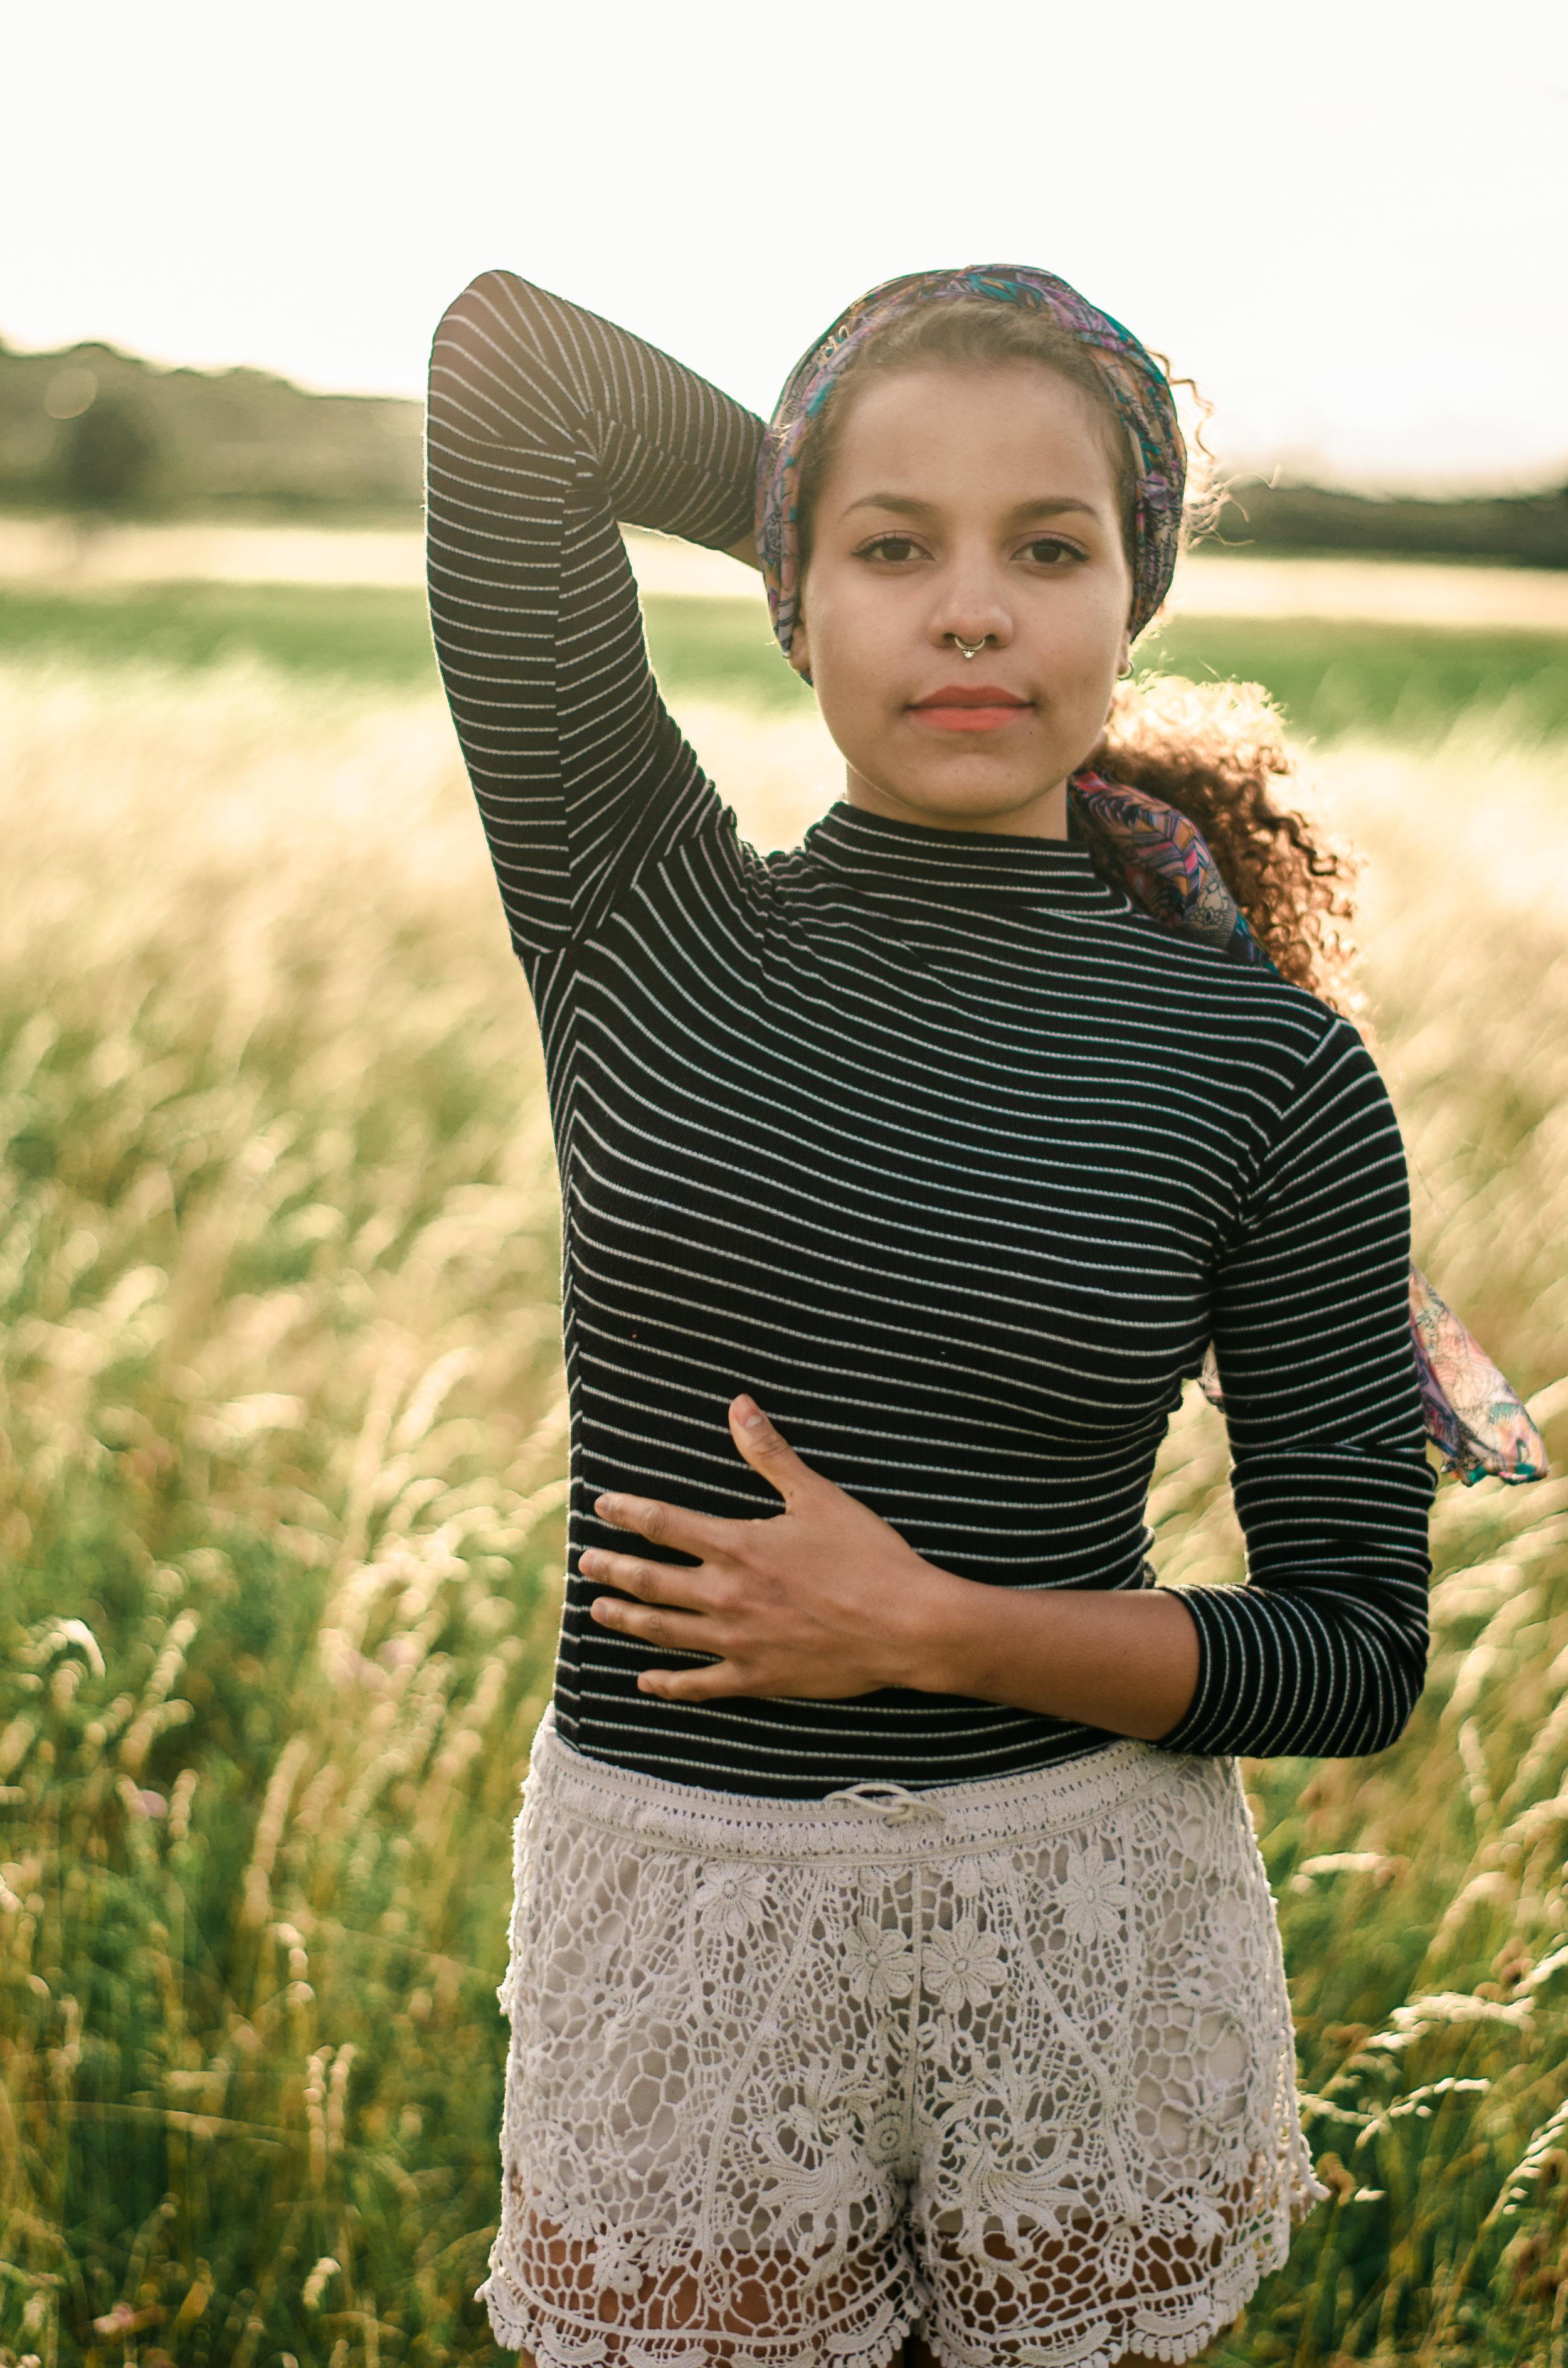 Inka-Portrait-Session-Aiste-Saulyte-Photography-17-07-30-303.jpg